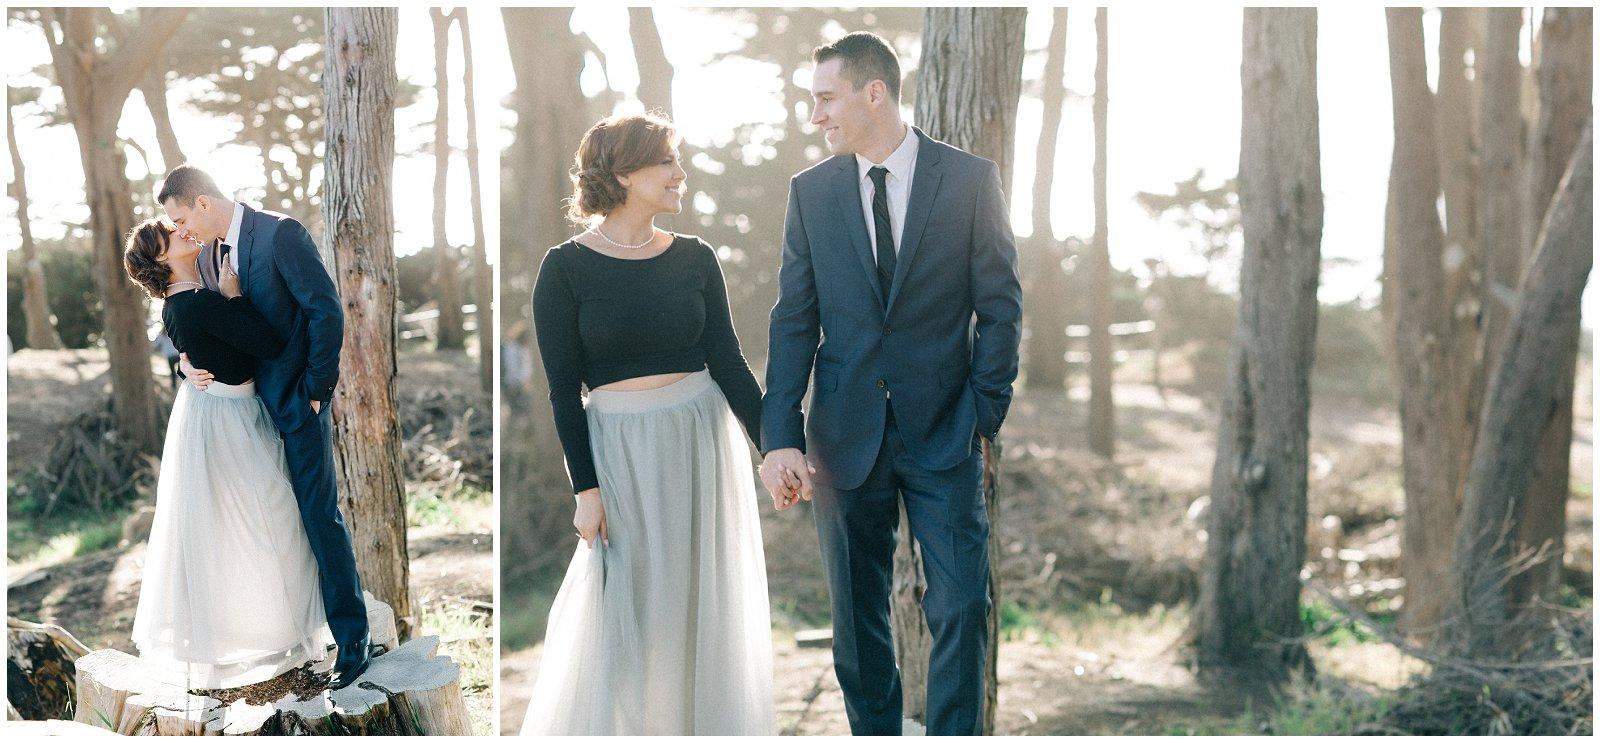 San-Francisco-Bay-Area-Wedding-Photography-Engagment-Session-5.jpg